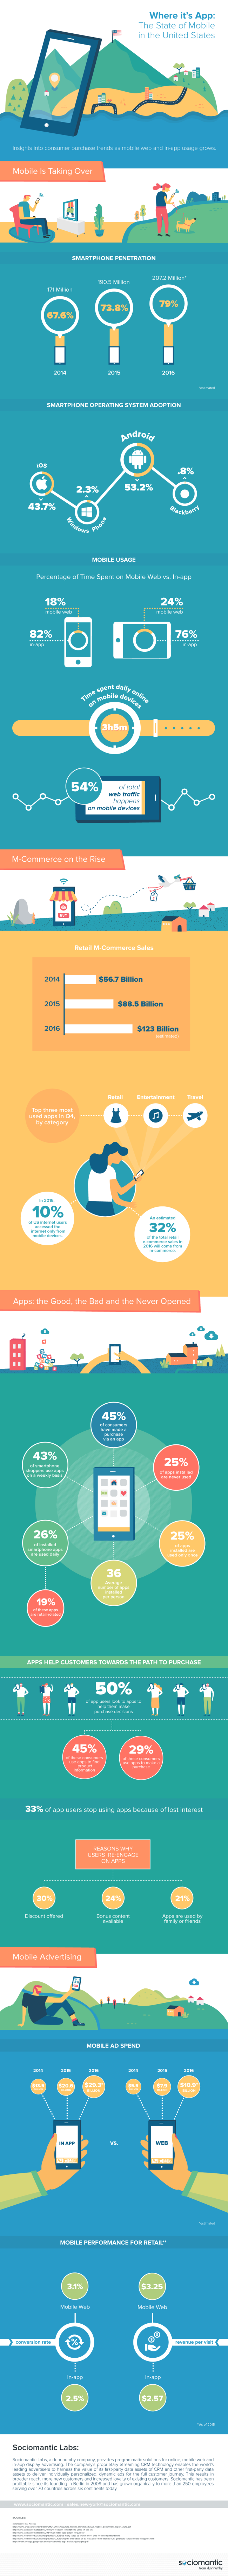 Sociomantic-Labs-Mobile-Infographic_US-e1470412855830